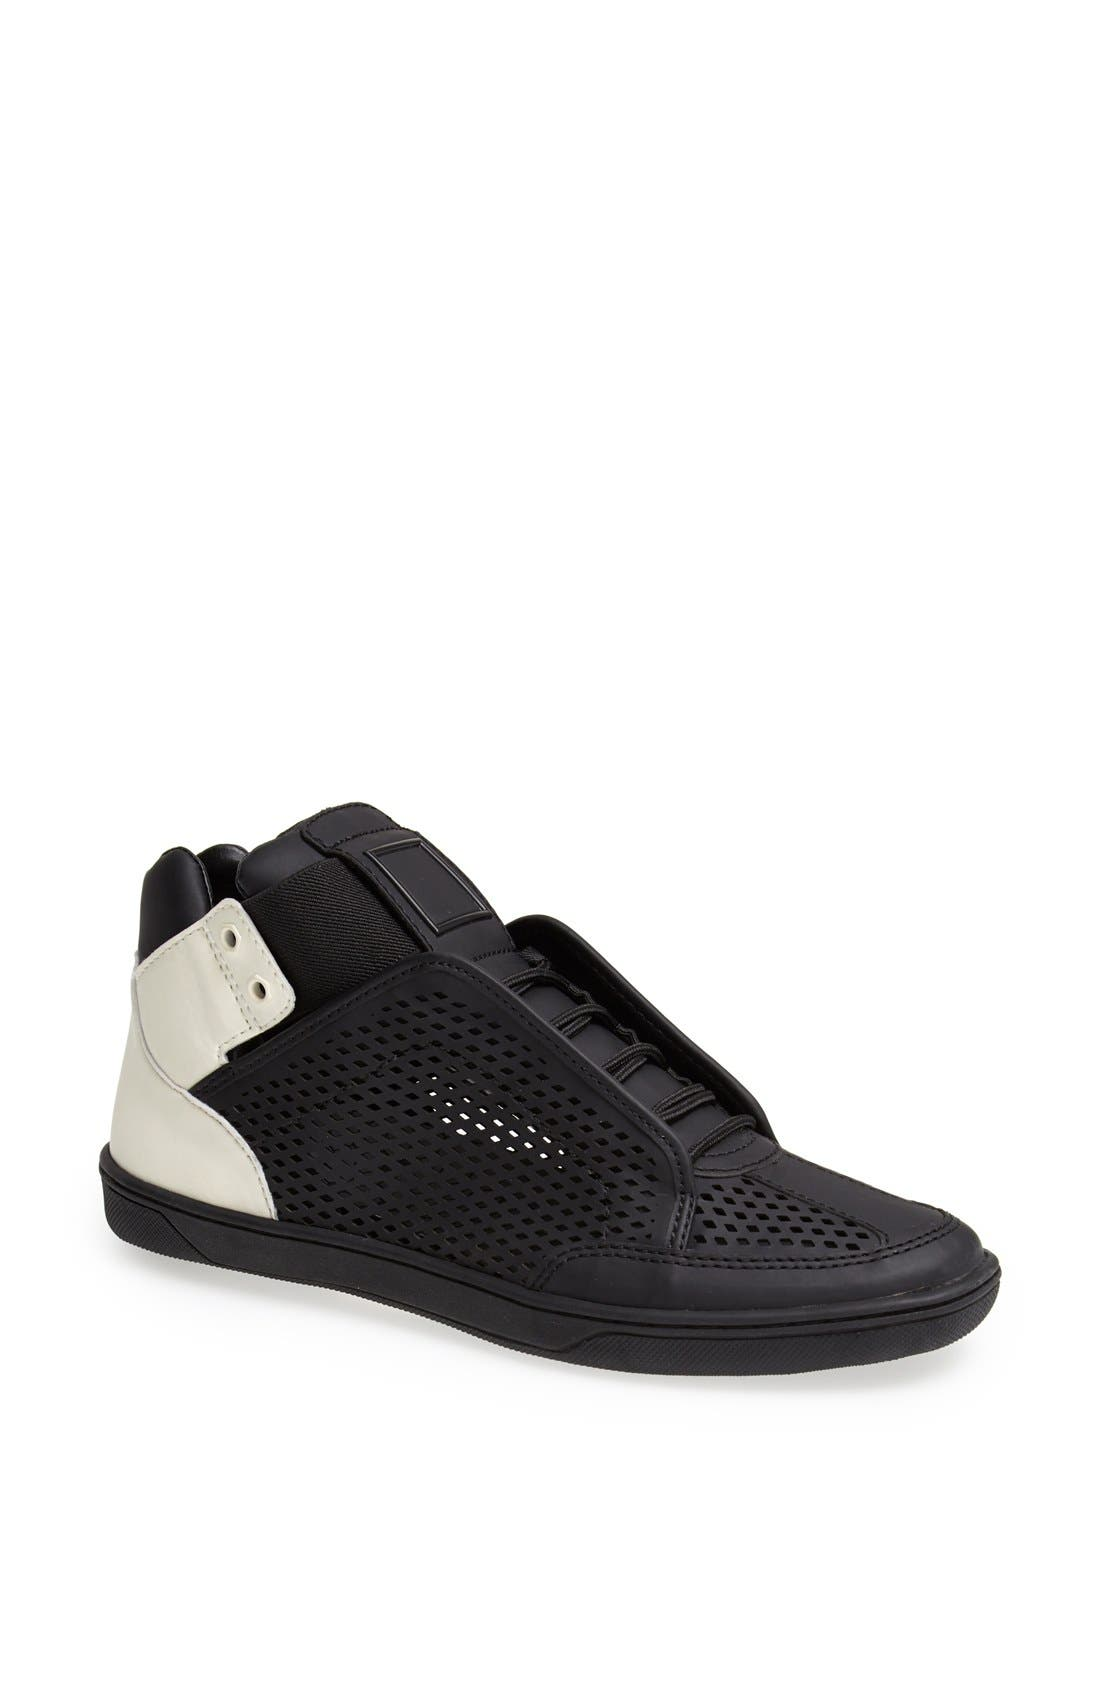 Main Image - Dolce Vita 'Vinna' Sneaker